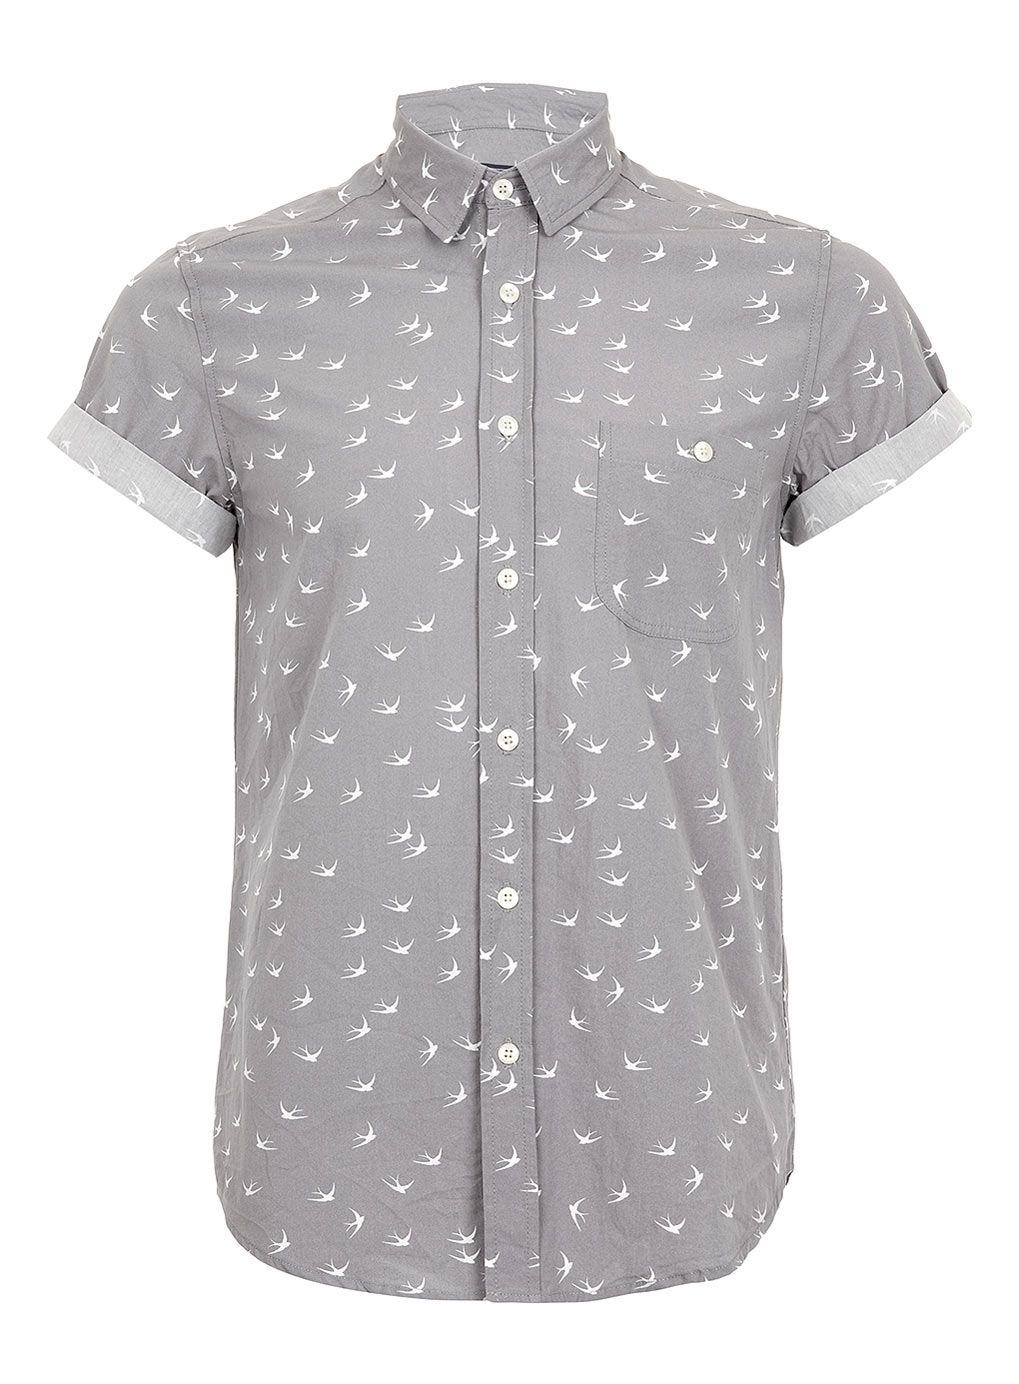 27063120 Grey Swallows Print Short Sleeve Shirt, TopMan | Wear it! | Shirts ...